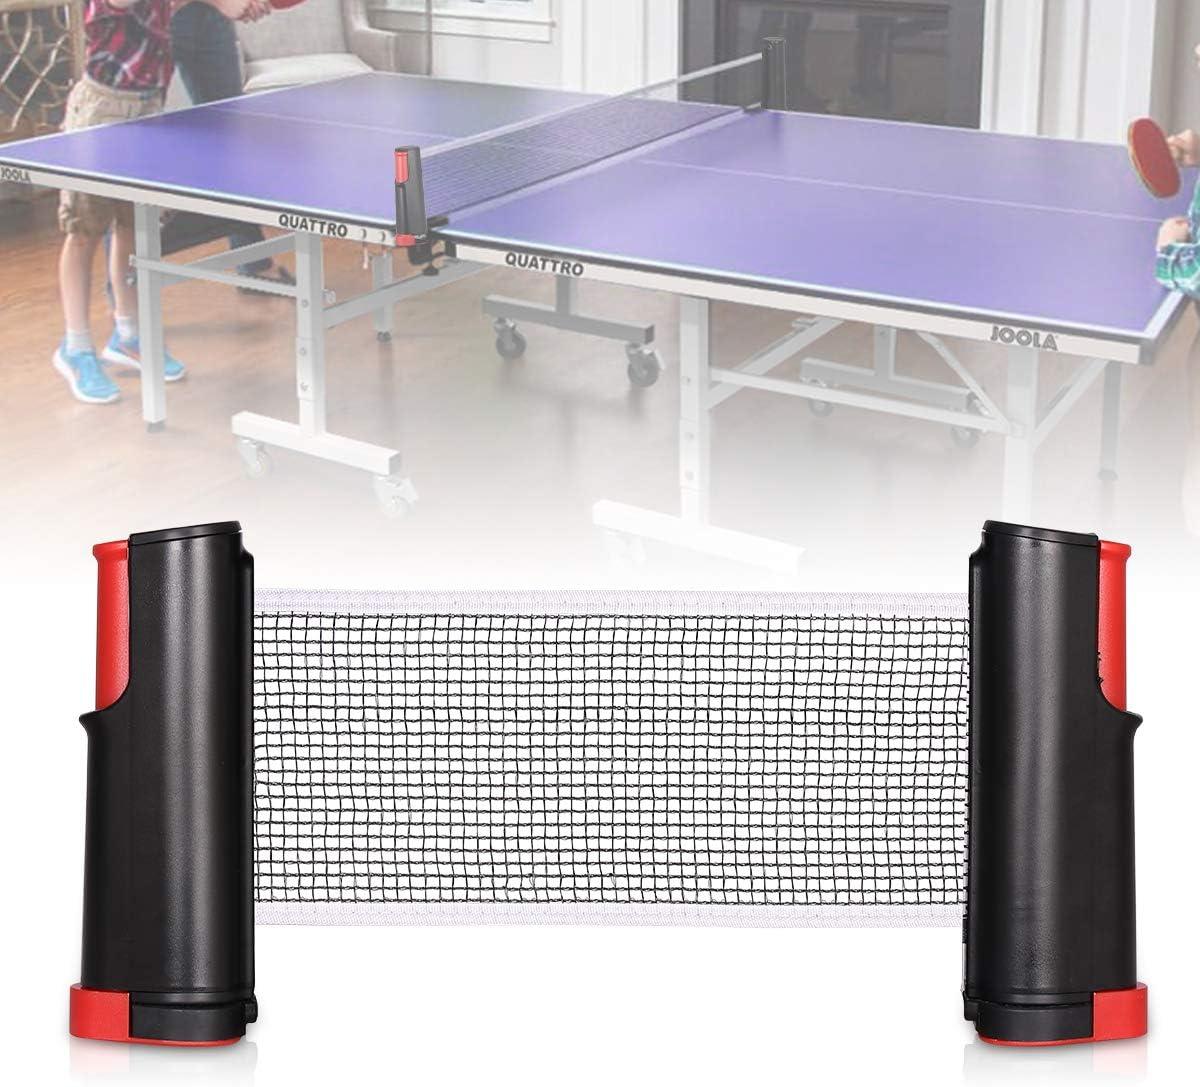 Bilisder Ping Pong Redes, Retráctiles de Ping Pong Pong de Reemplazo de la Red de Abrazaderas Ajustable Longitud 175 cm x 15 cm